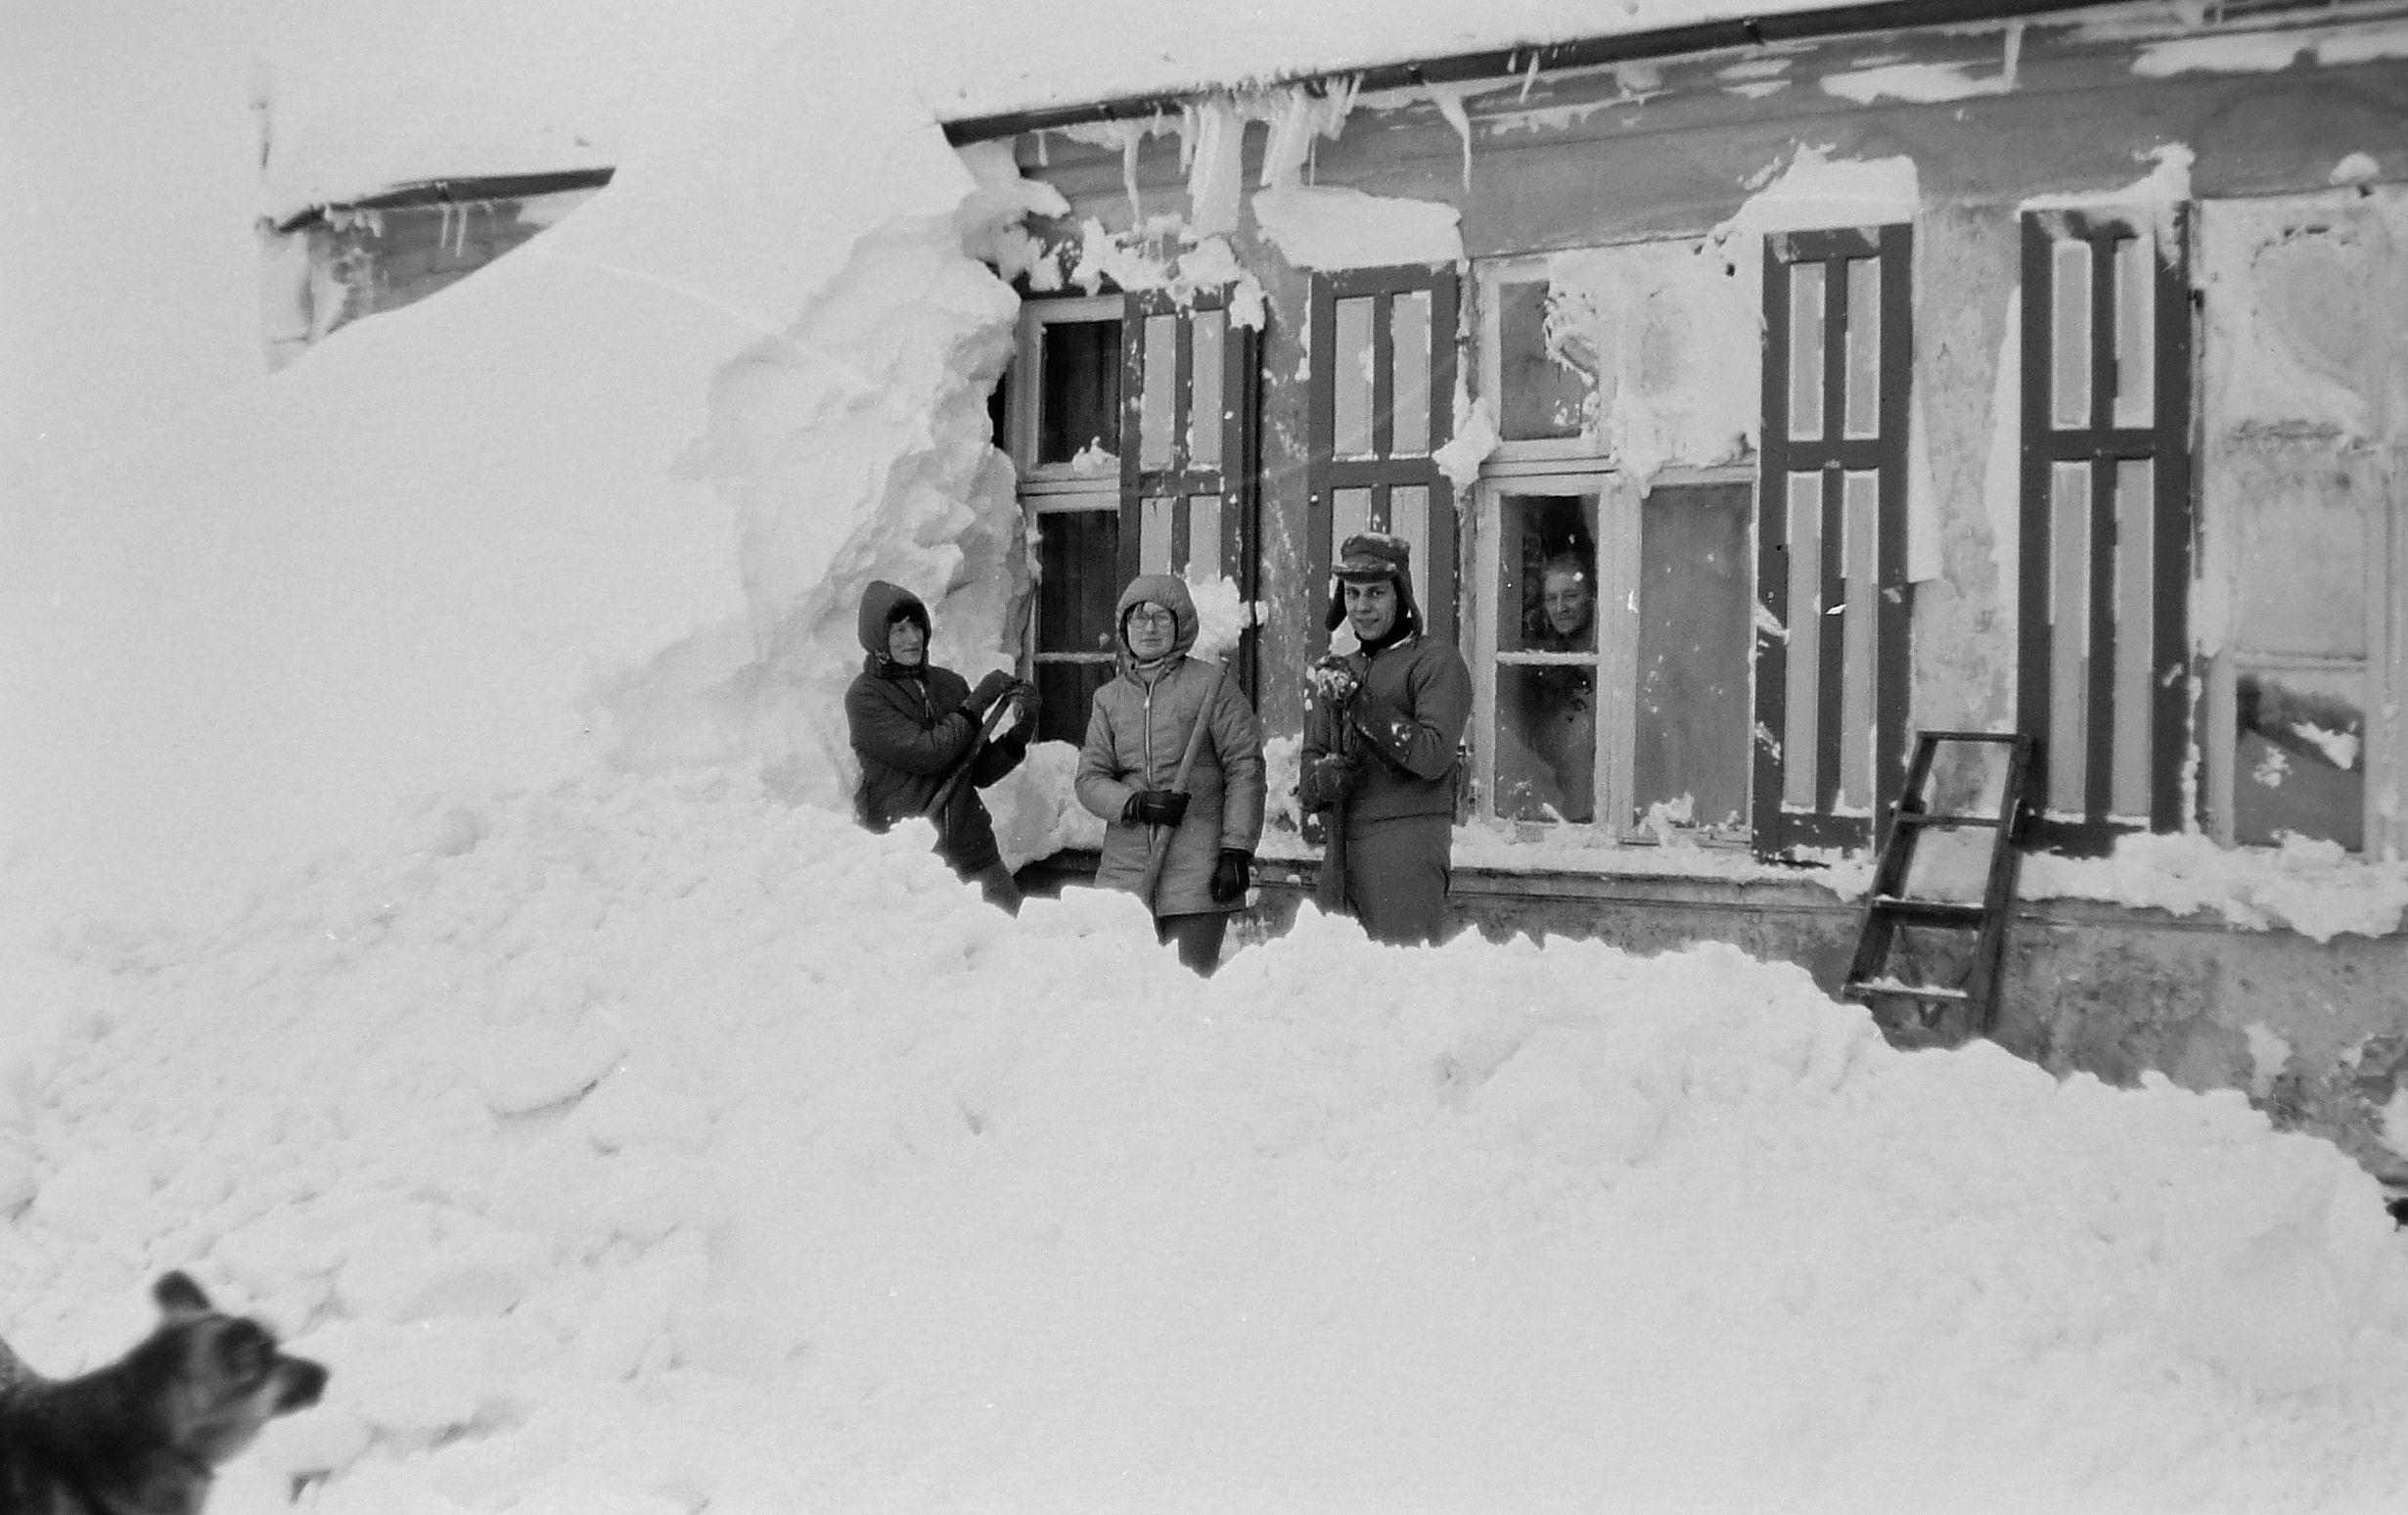 Winter 78/79